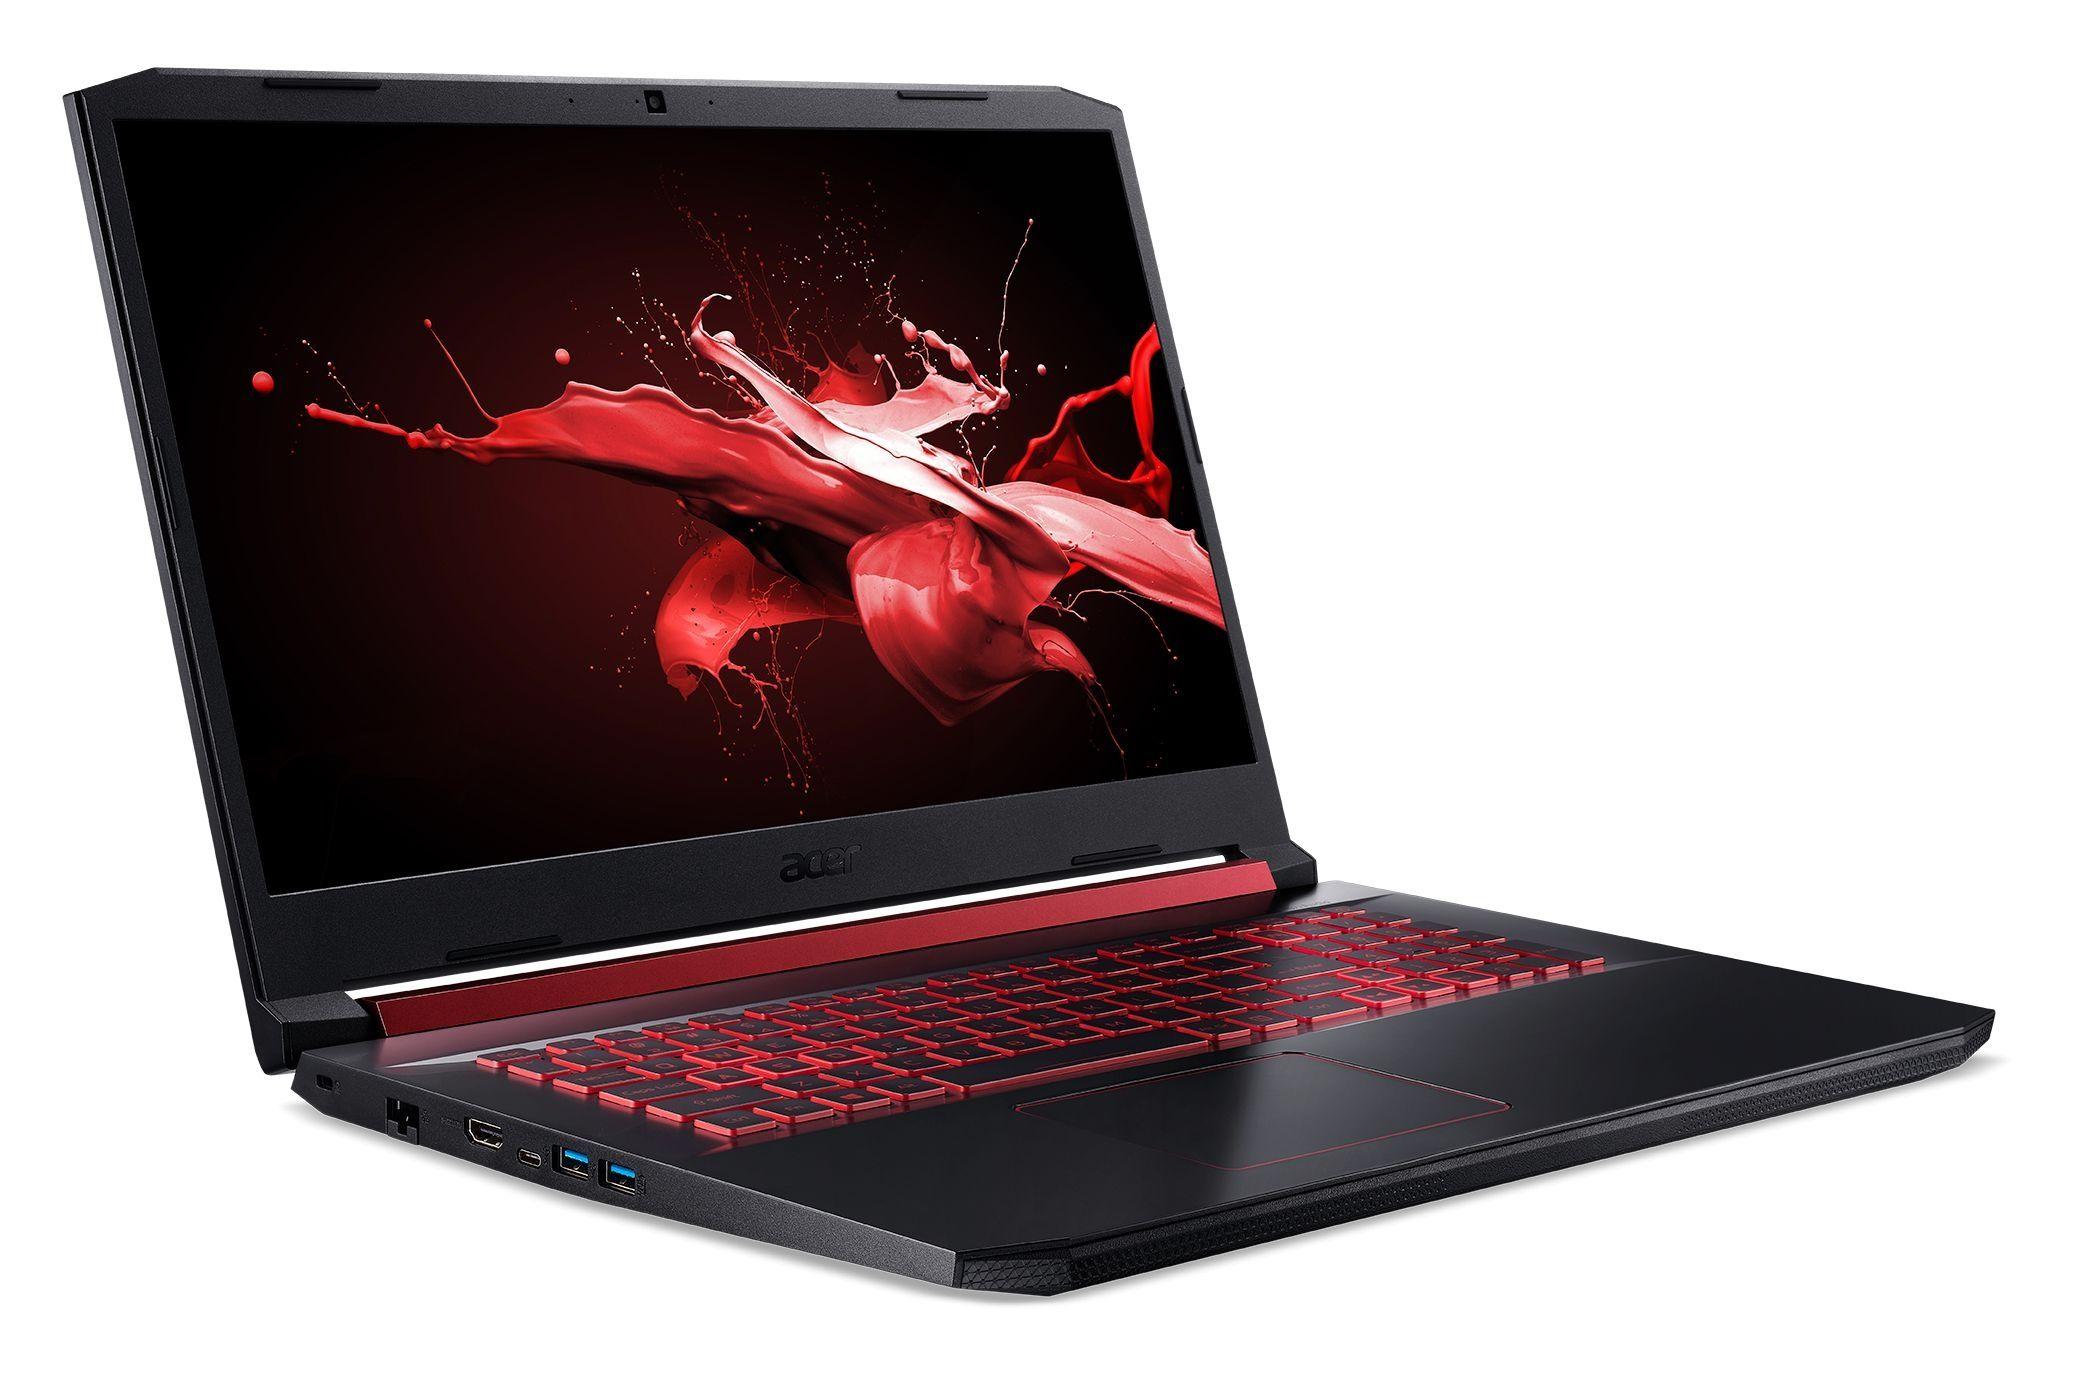 "Геймърски лаптоп Acer Nitro 5 - AN517-51-7553, 17.3"", FHD, черен - 2"